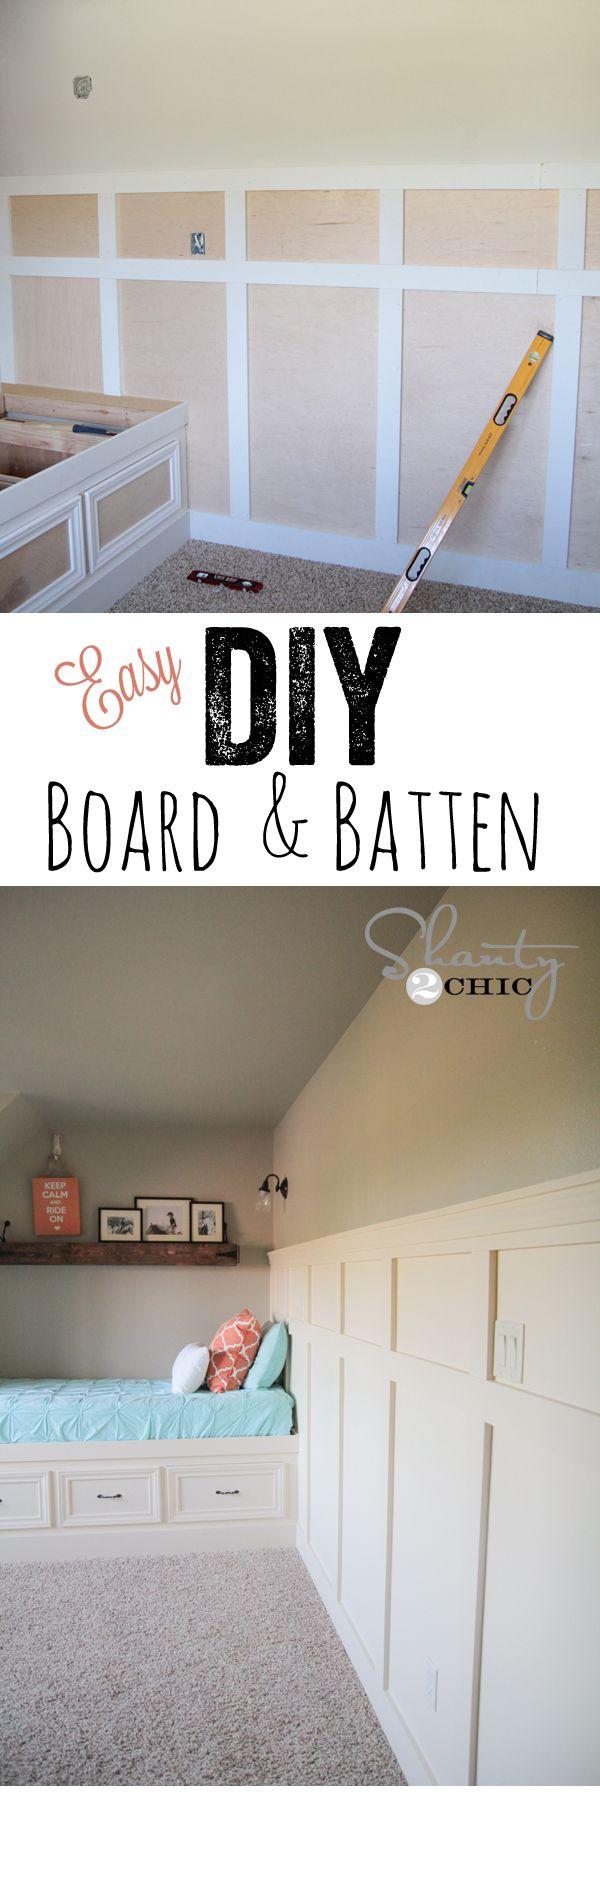 LOVE this Board & Batten tutorial using plywood! So easy! www.shanty-2-chic.com